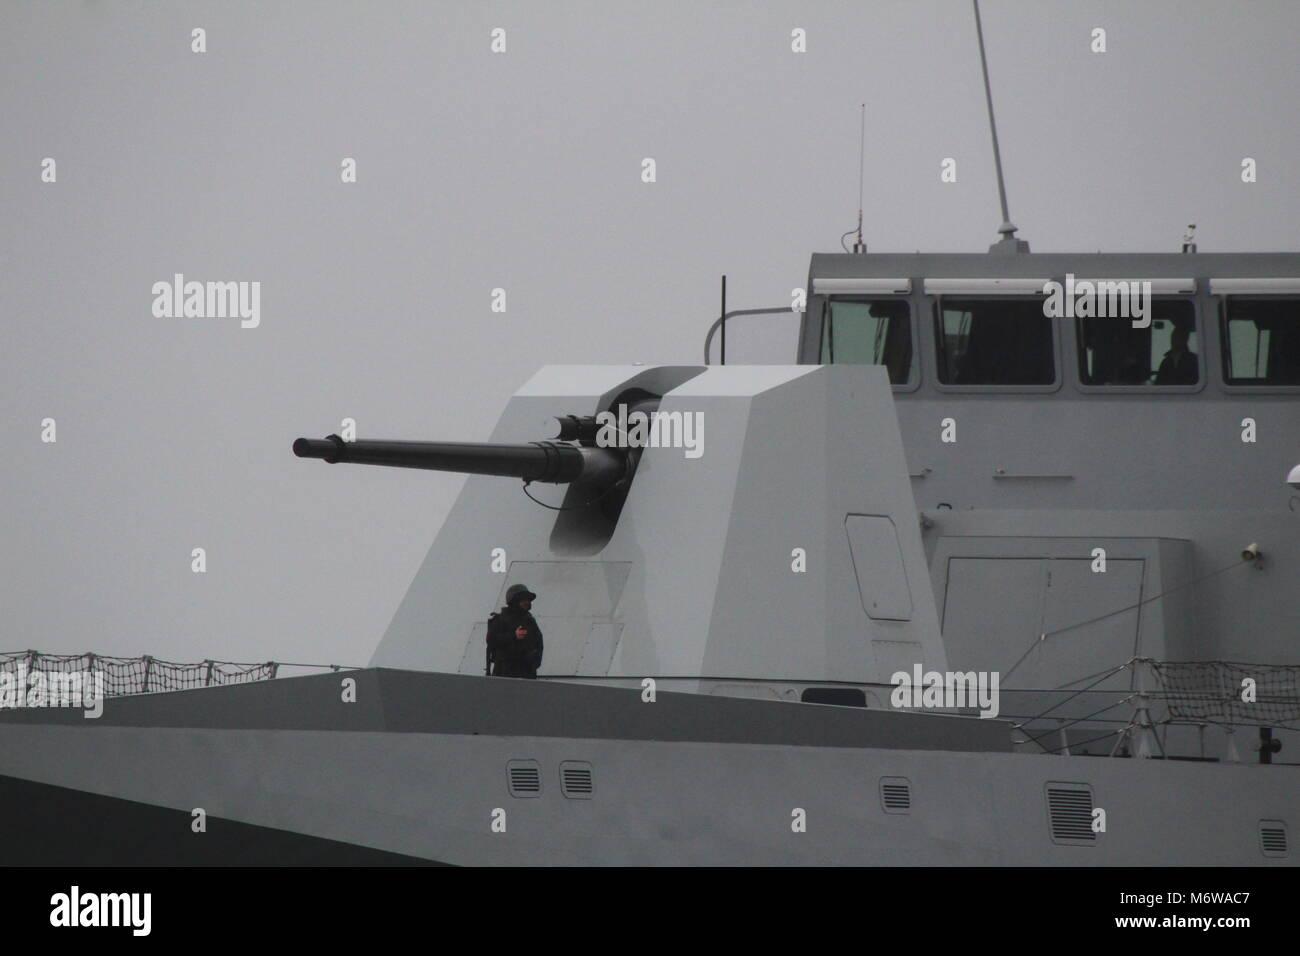 An Oto Melara 127/64 Lightweight (LW) naval gun, carried on ITS Luigi Rizzo (F565), a Bergamini-class frigate operated - Stock Image